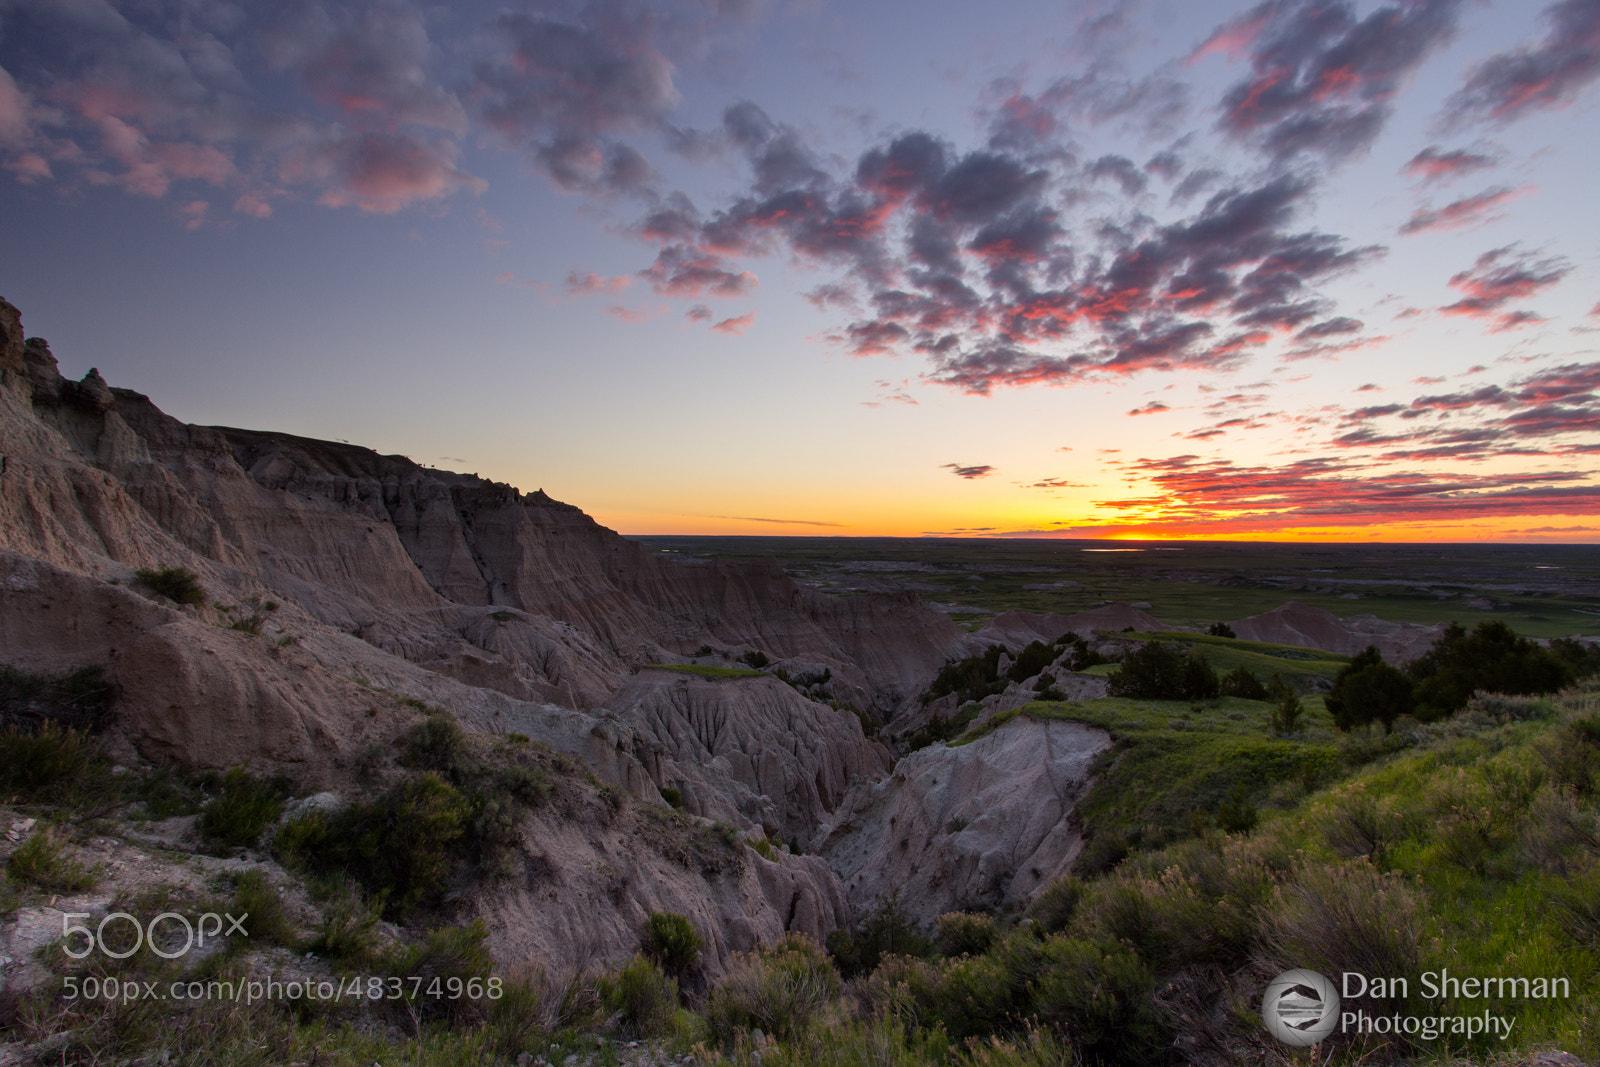 Photograph Badlands by Dan Sherman on 500px